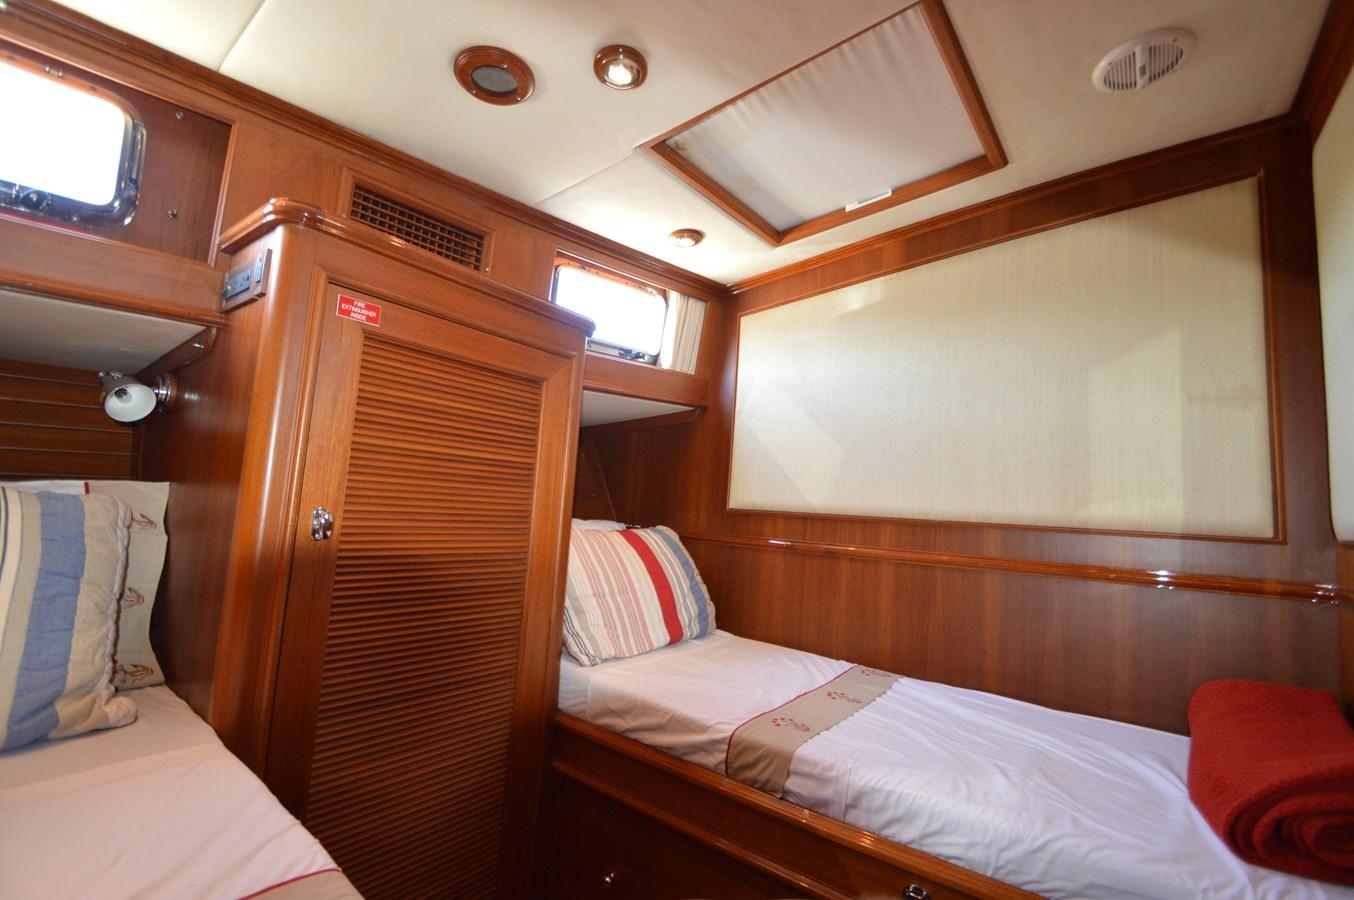 70 2004 GRAND BANKS 58 Eastbay Motor Yacht 2713459